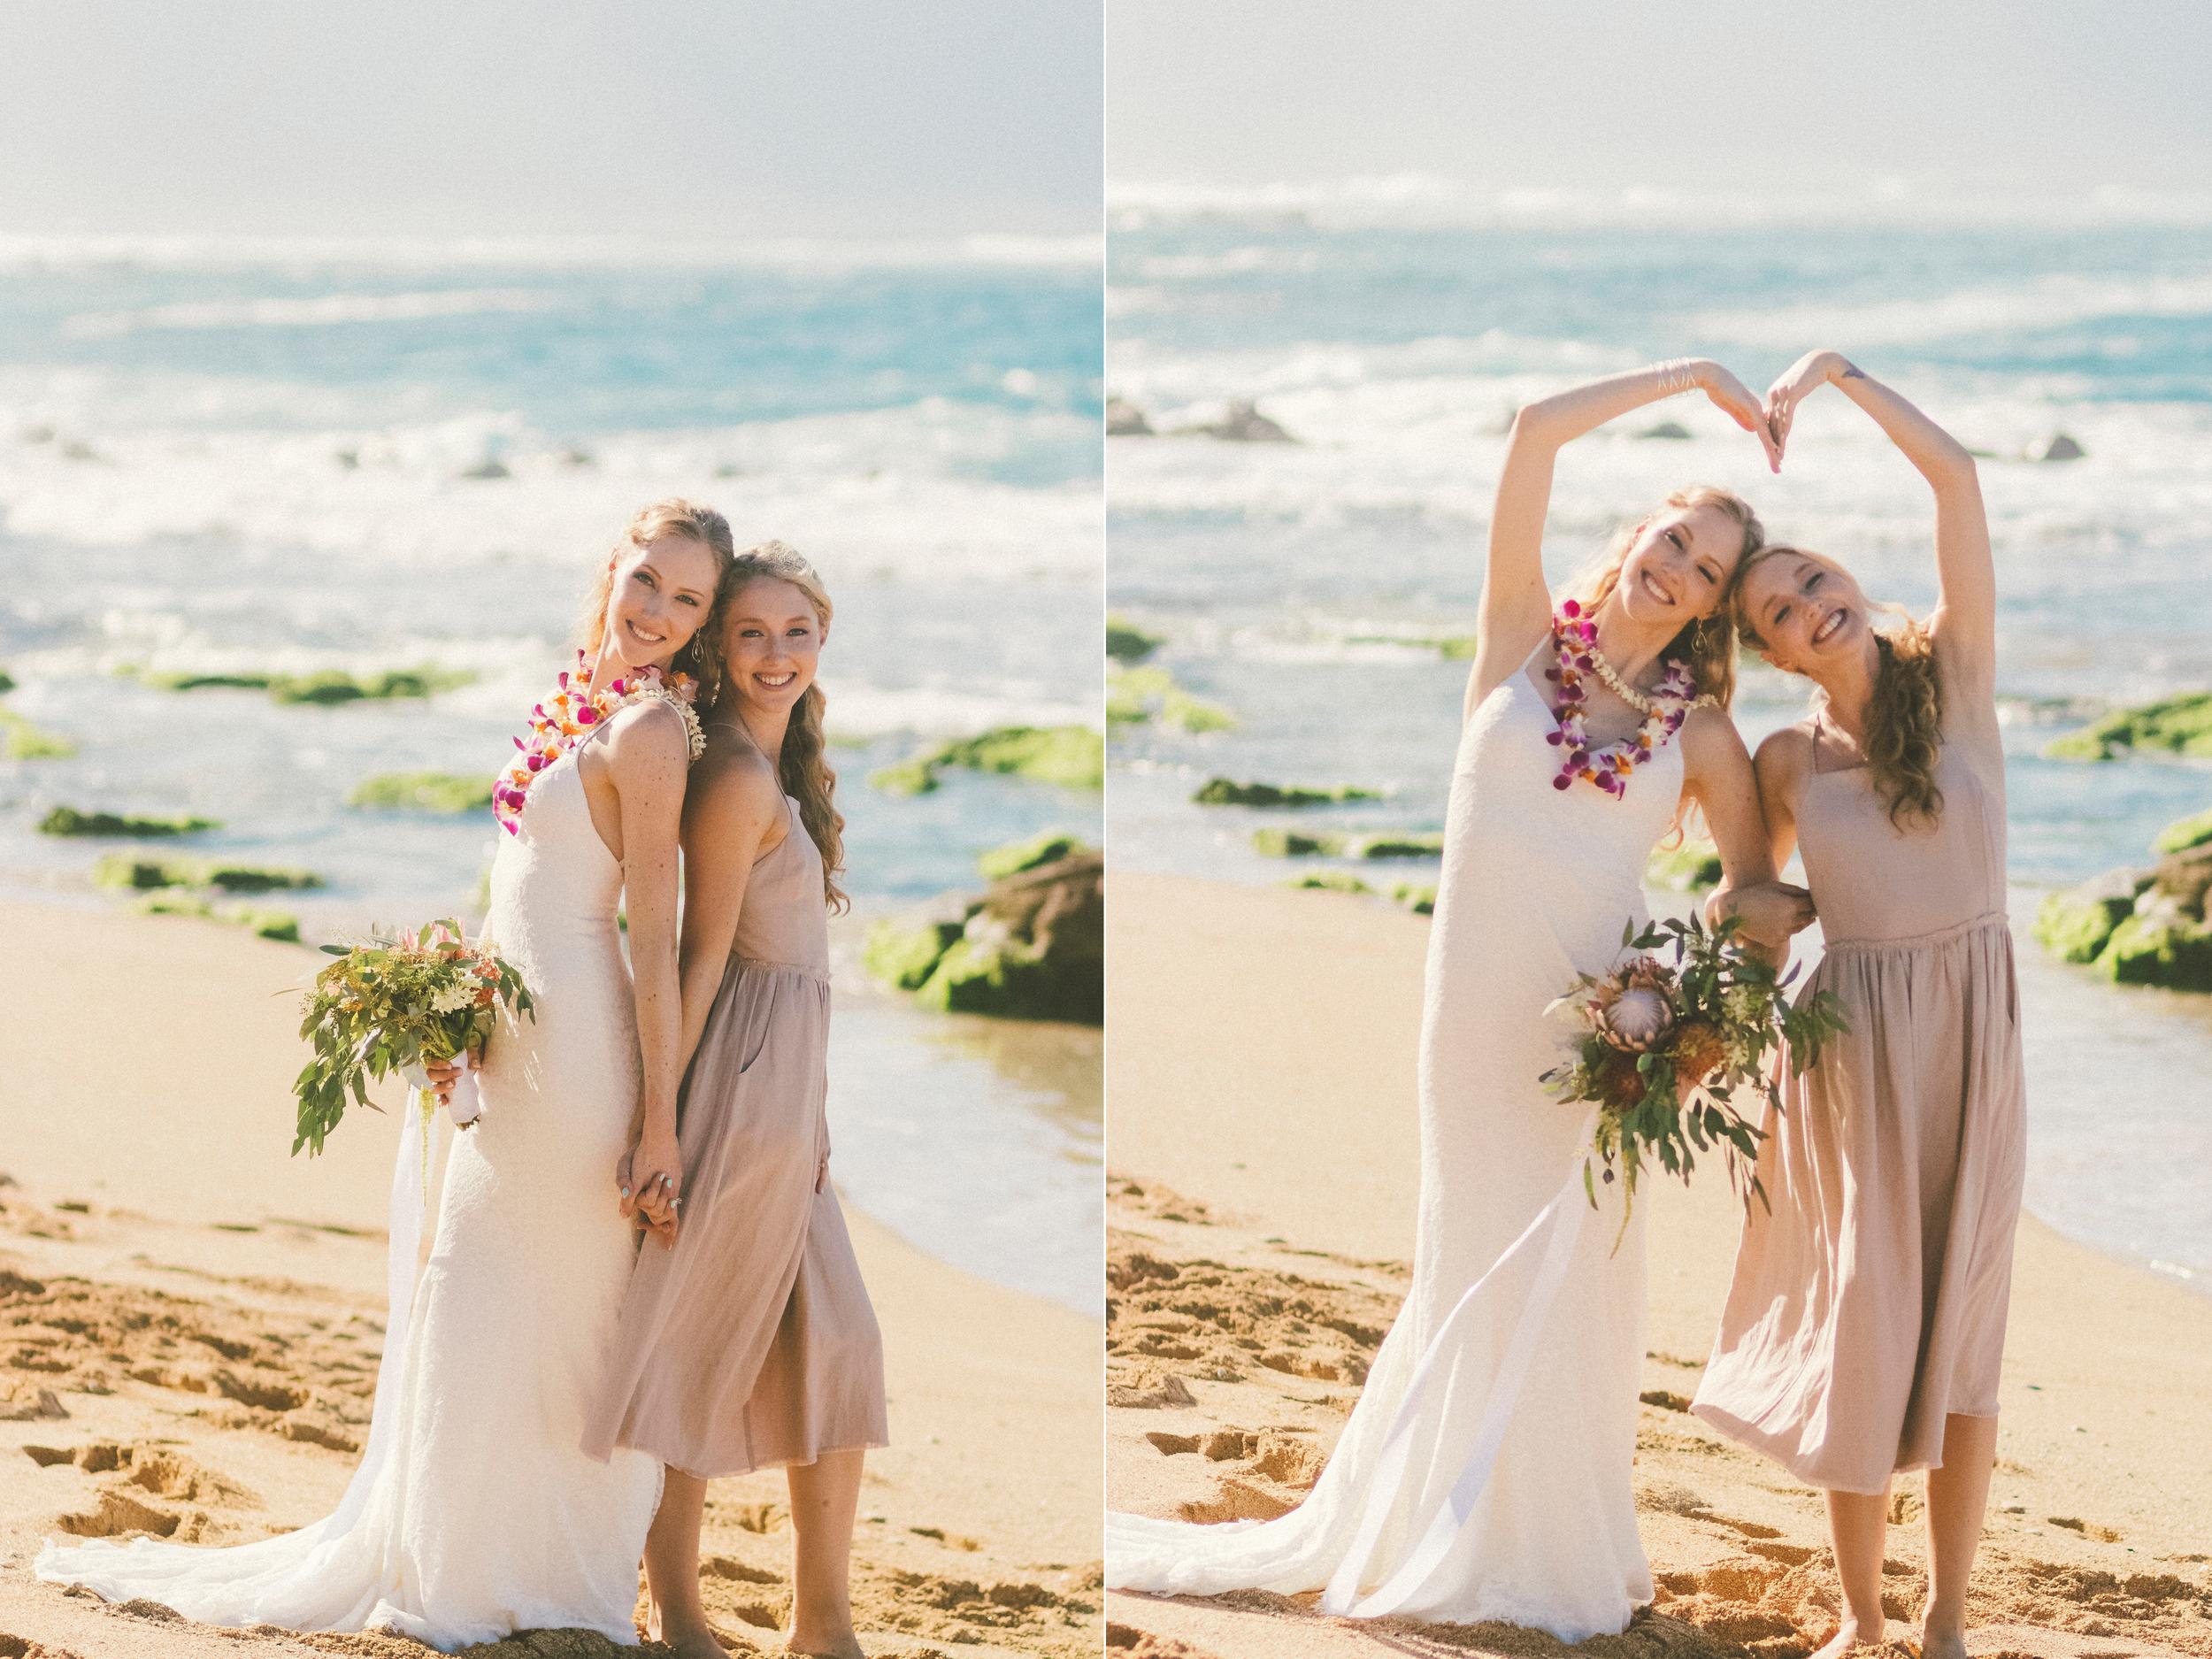 angie-diaz-photography-maui-wedding-76.jpg